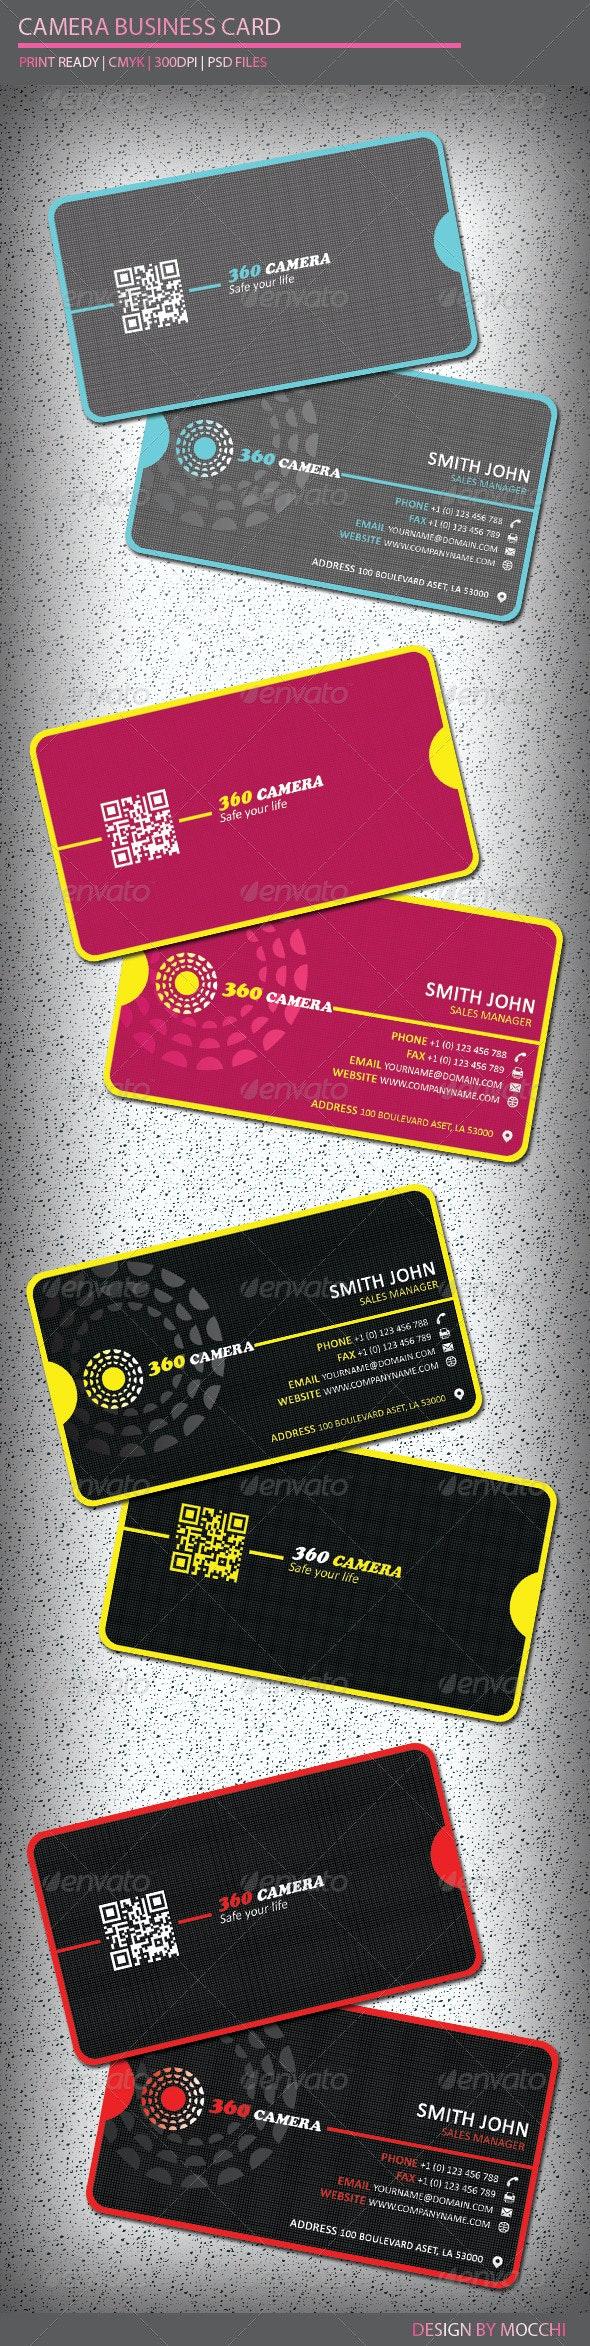 Camera Business Card - Creative Business Cards